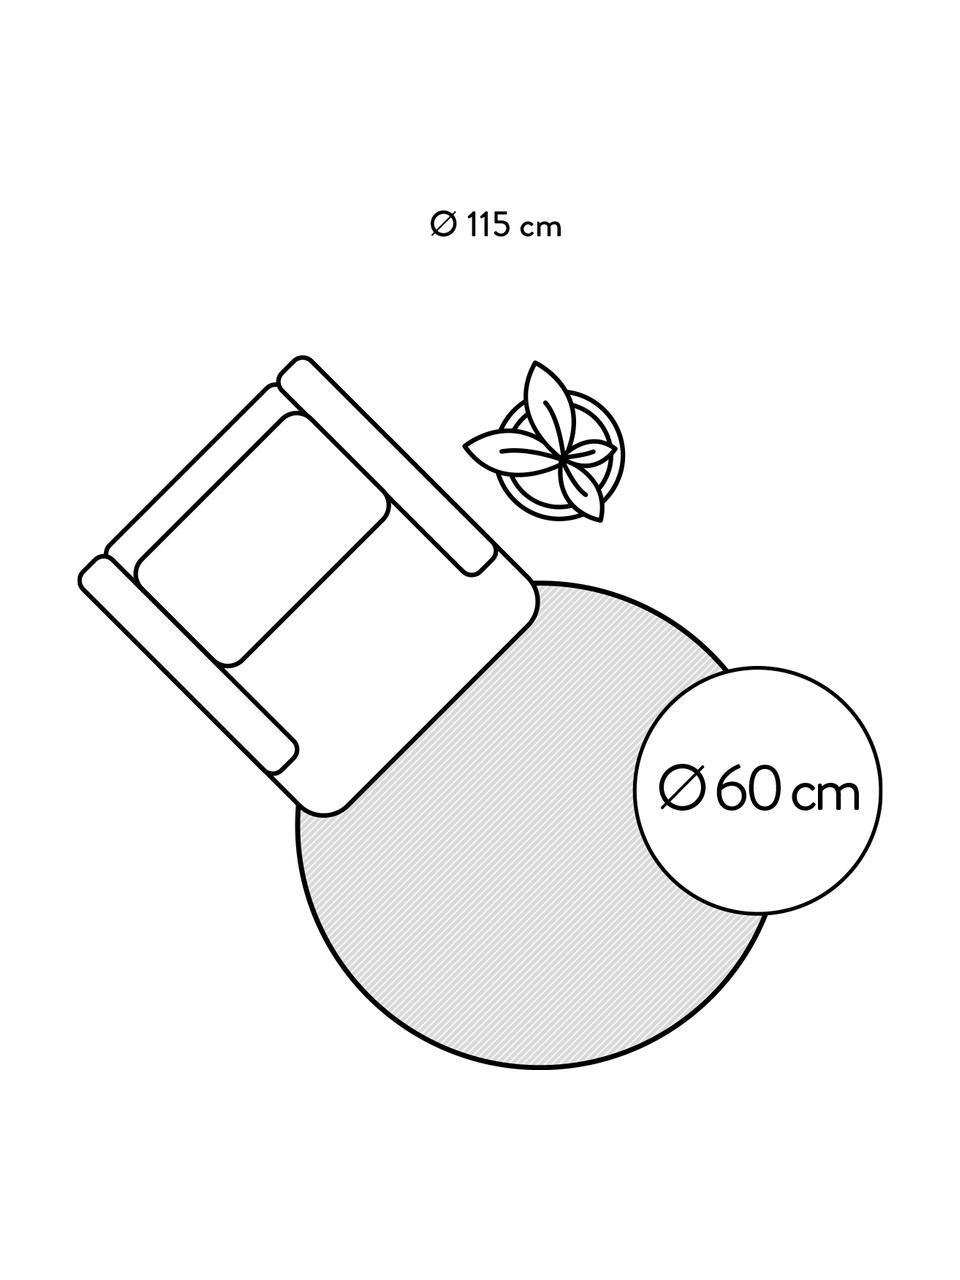 Runder Viskoseteppich Jane in Silbergrau, handgewebt, Flor: 100% Viskose, Silbergrau, Ø 200 cm (Größe L)